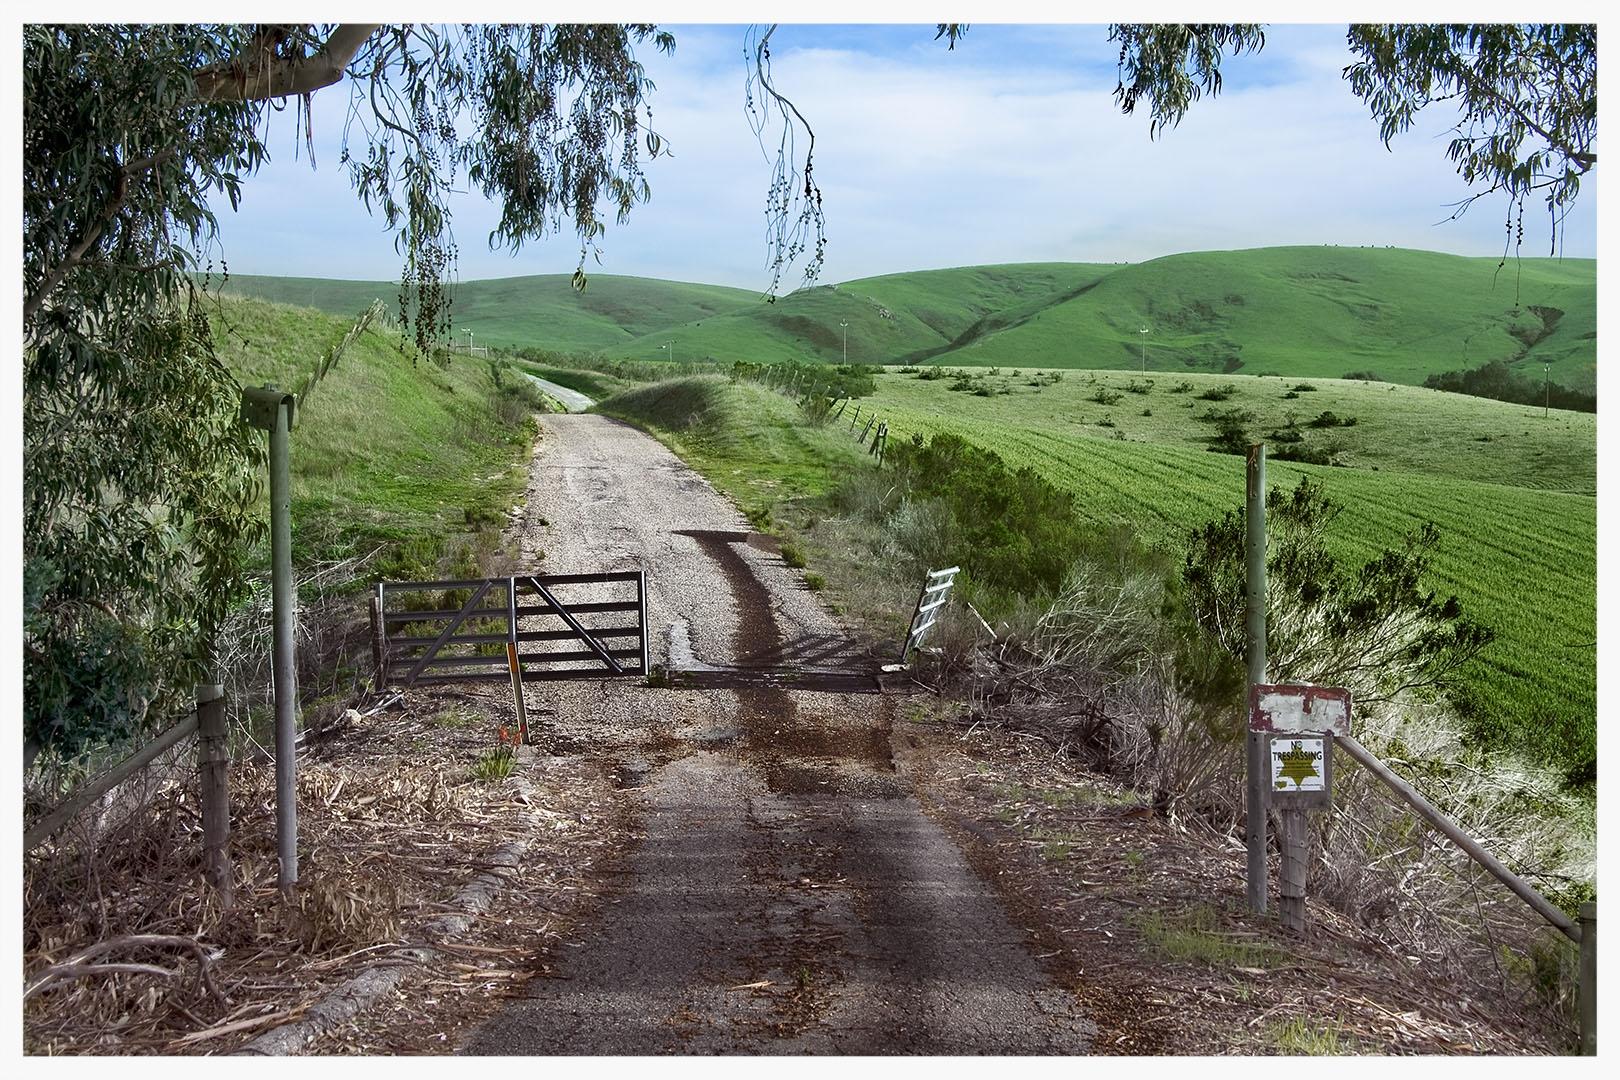 Country Gate, Near Morro Bay, California